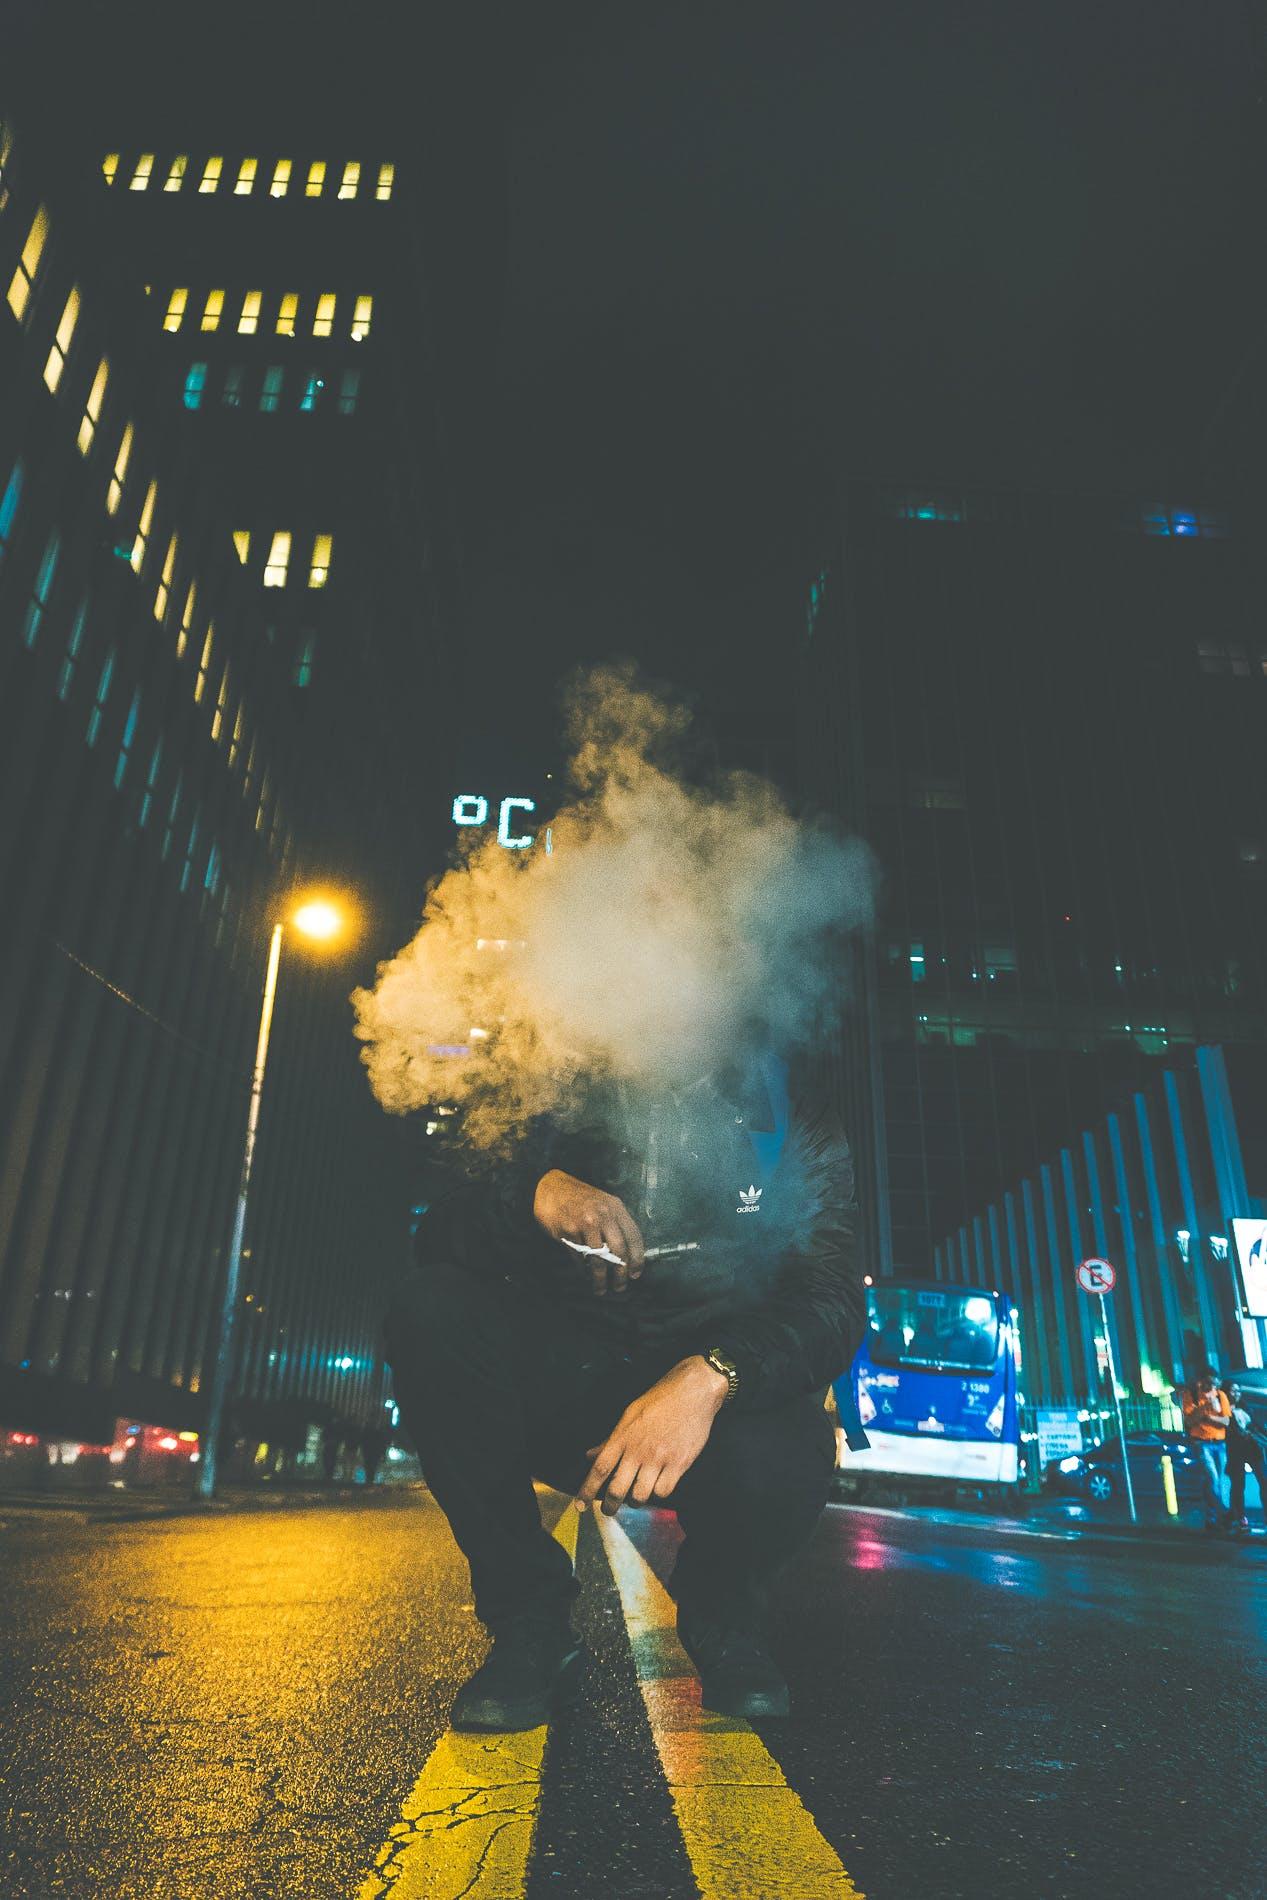 Man Cover by Smoke